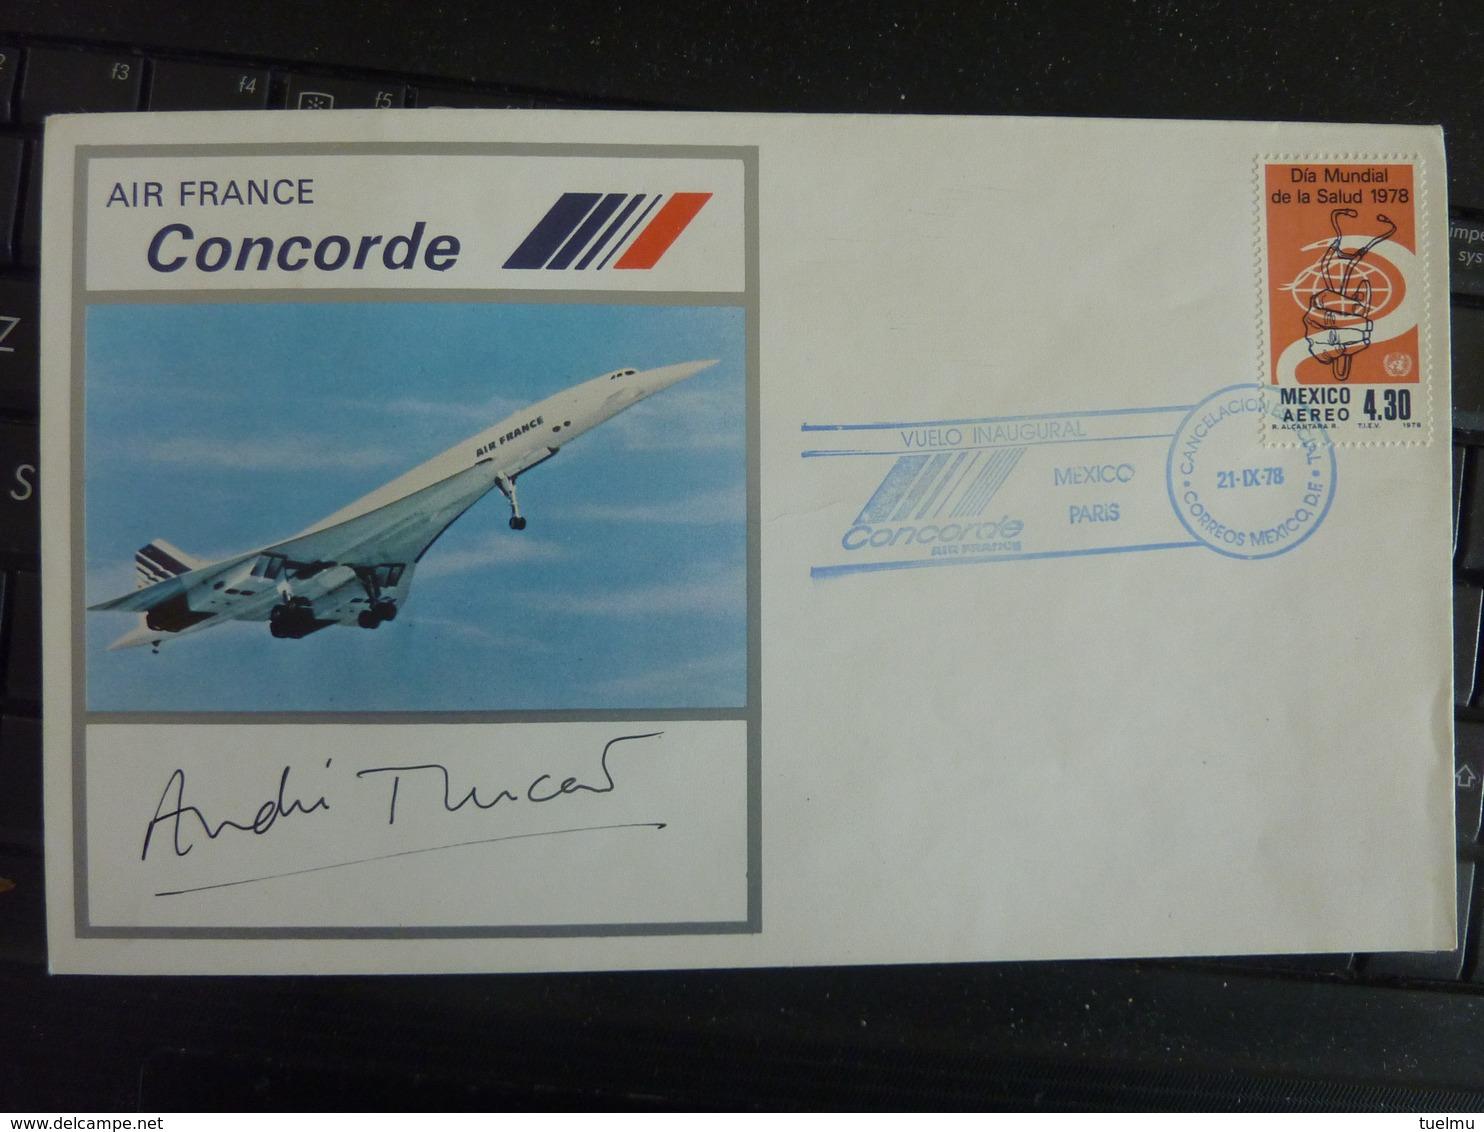 Andre Turcat Hand Signed Concorde Rare FDC Air  Pilot Autographed AUTOGRAPHE SIGNE 1978 MEXICO WASHINGTON VOL INAUGURAL - Autographs